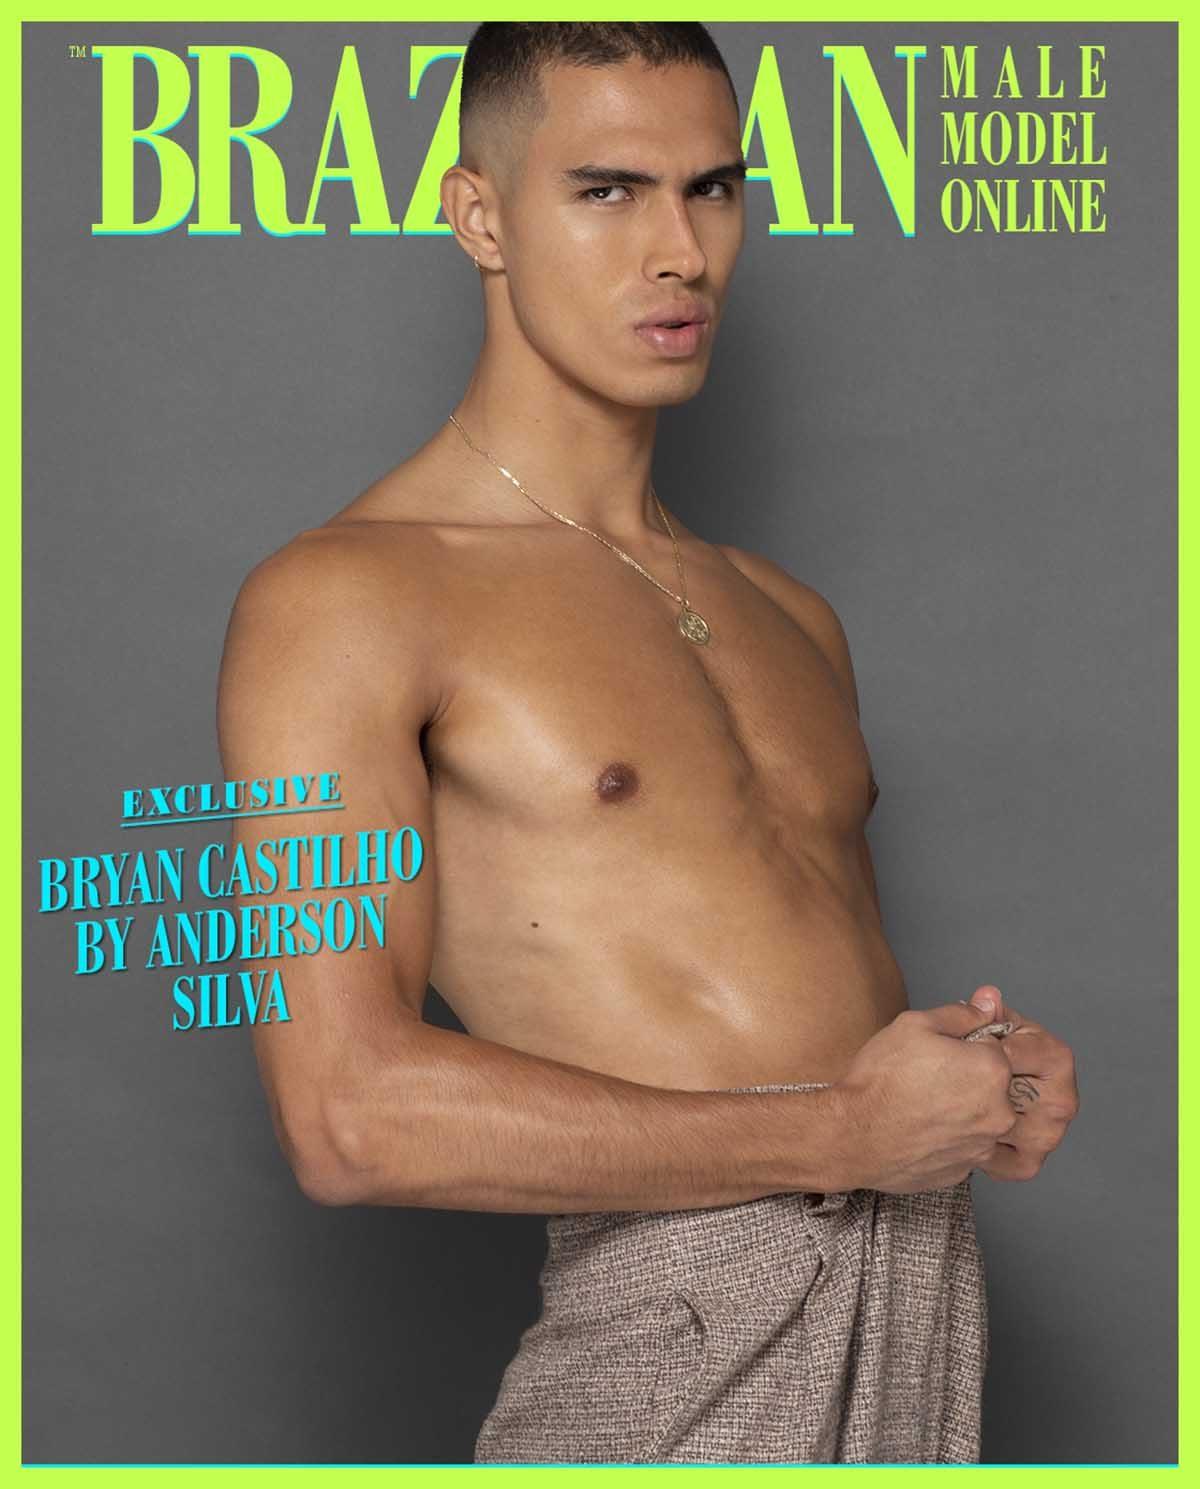 Bryan Castilho by Anderson Silva